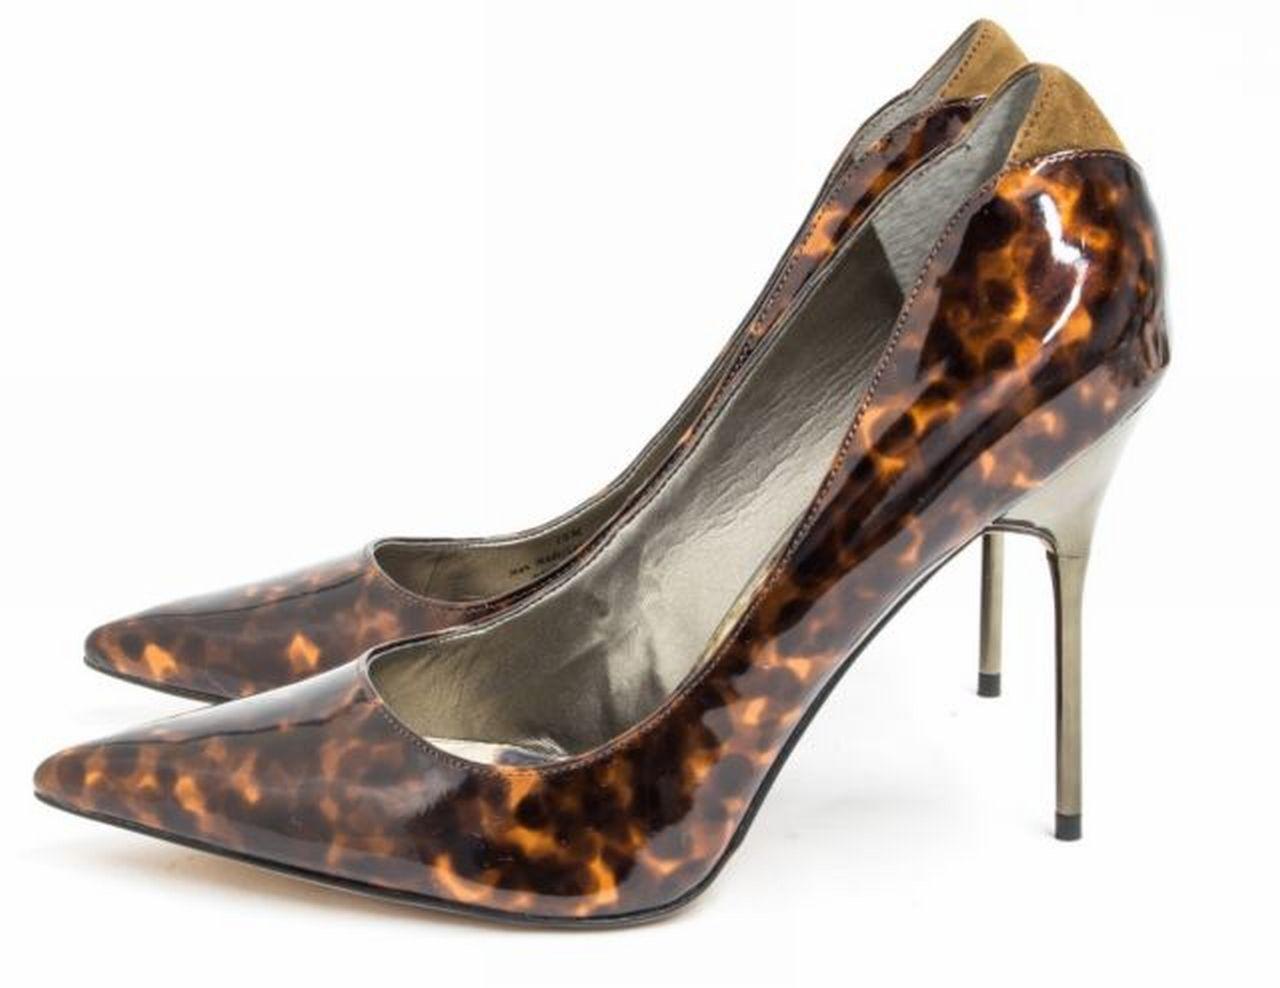 d0b2039465e8 Sam Edelman Danielle Sz 8 Tortoise Pump Silver Heel Re Soled Patent ...